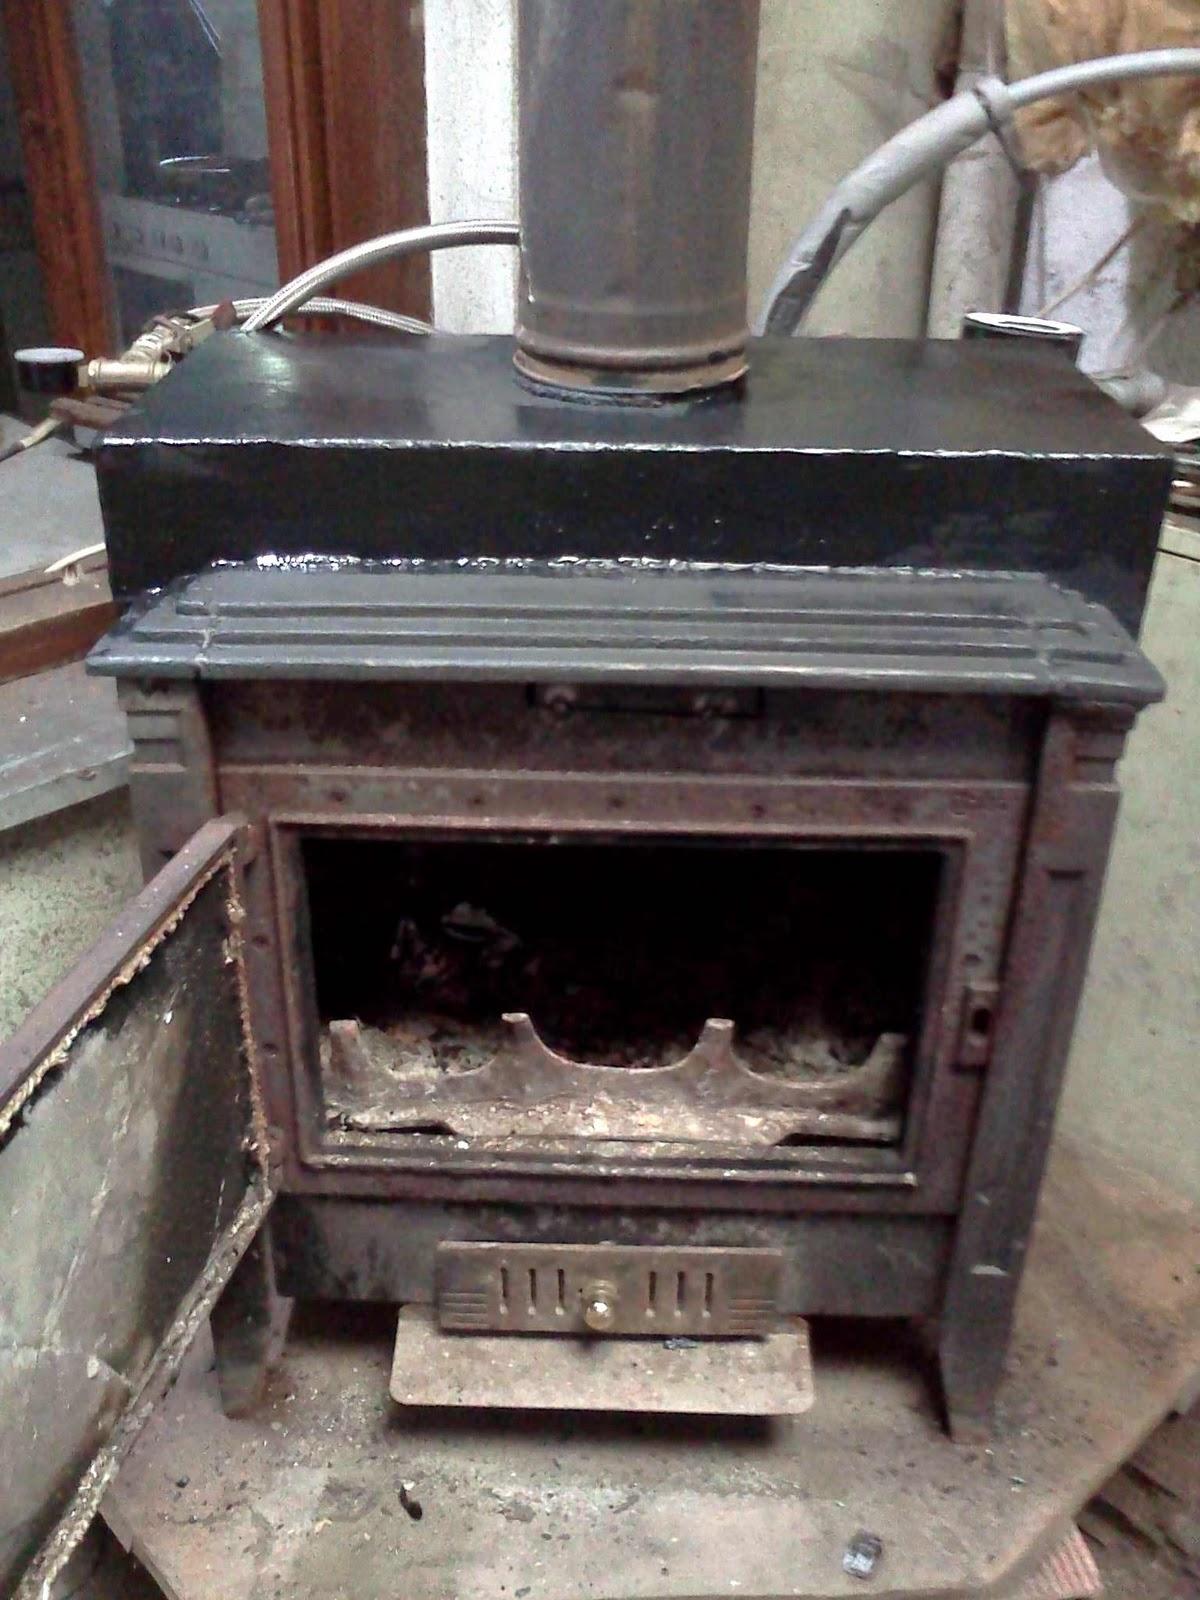 Tecnolog a para un progreso sostenible caldera de biomasa - Estufa de lena para radiadores ...